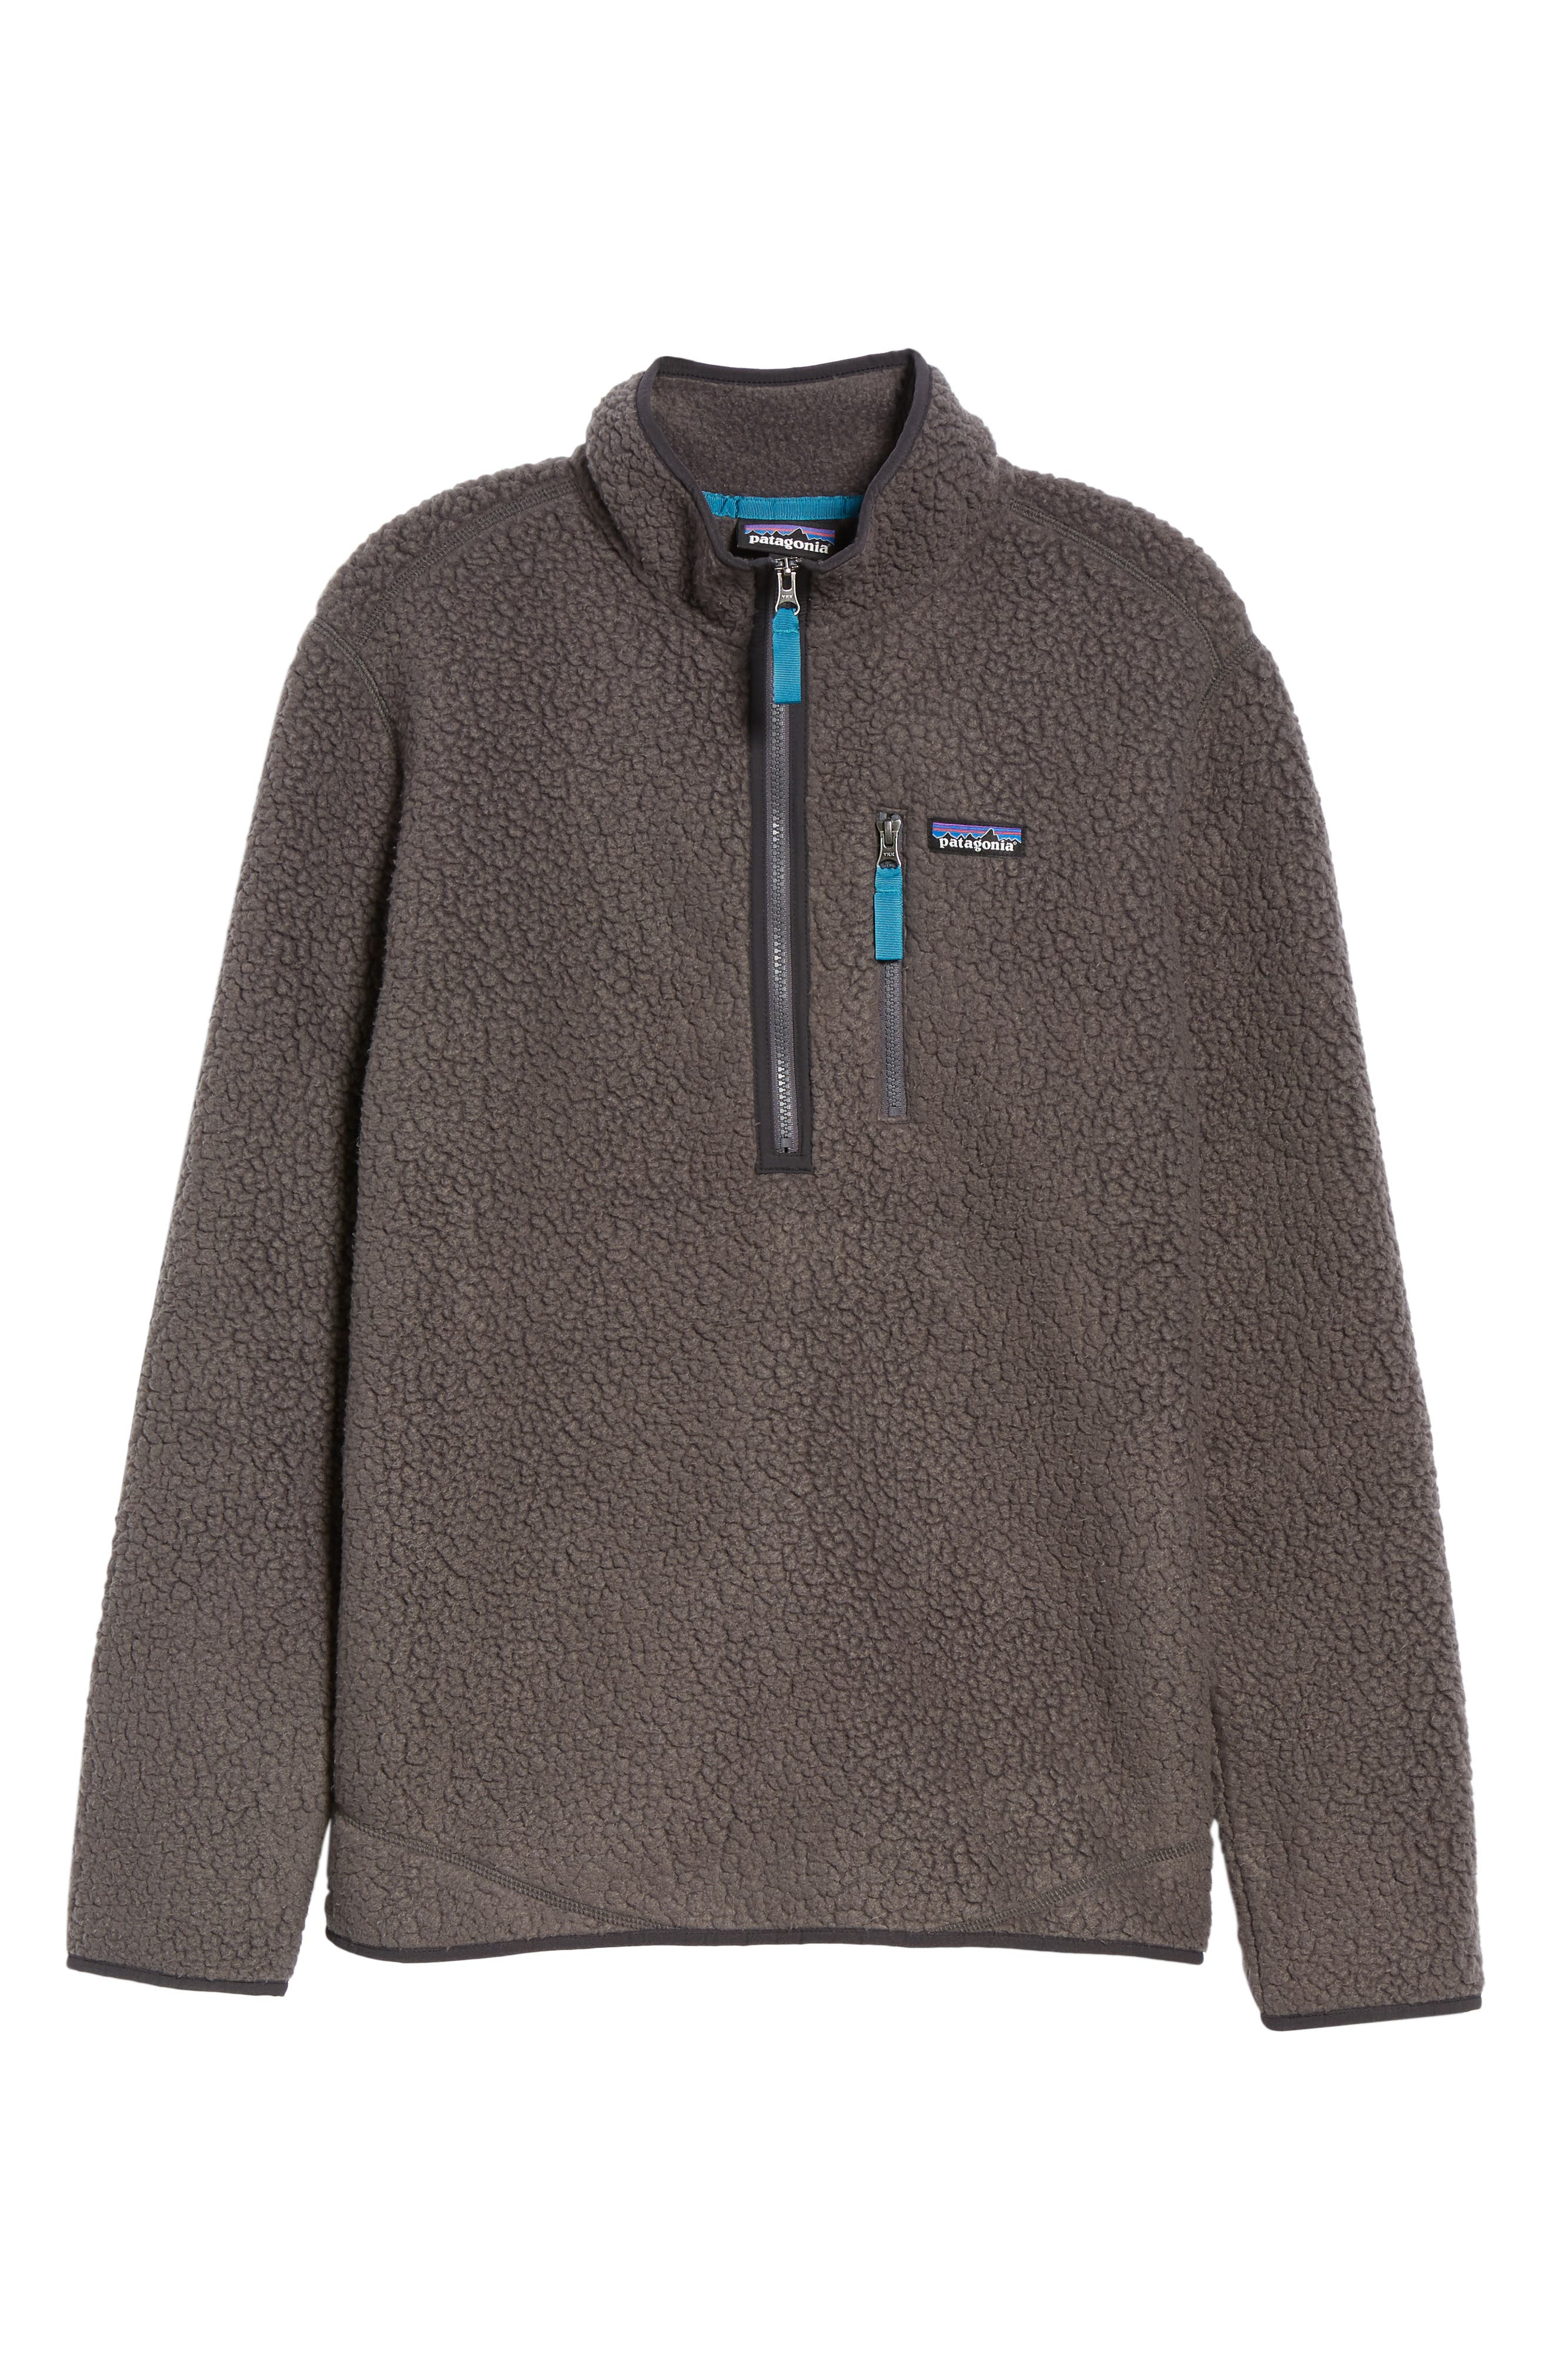 Retro Pile Fleece Zip Jacket,                             Alternate thumbnail 6, color,                             FORGE GREY